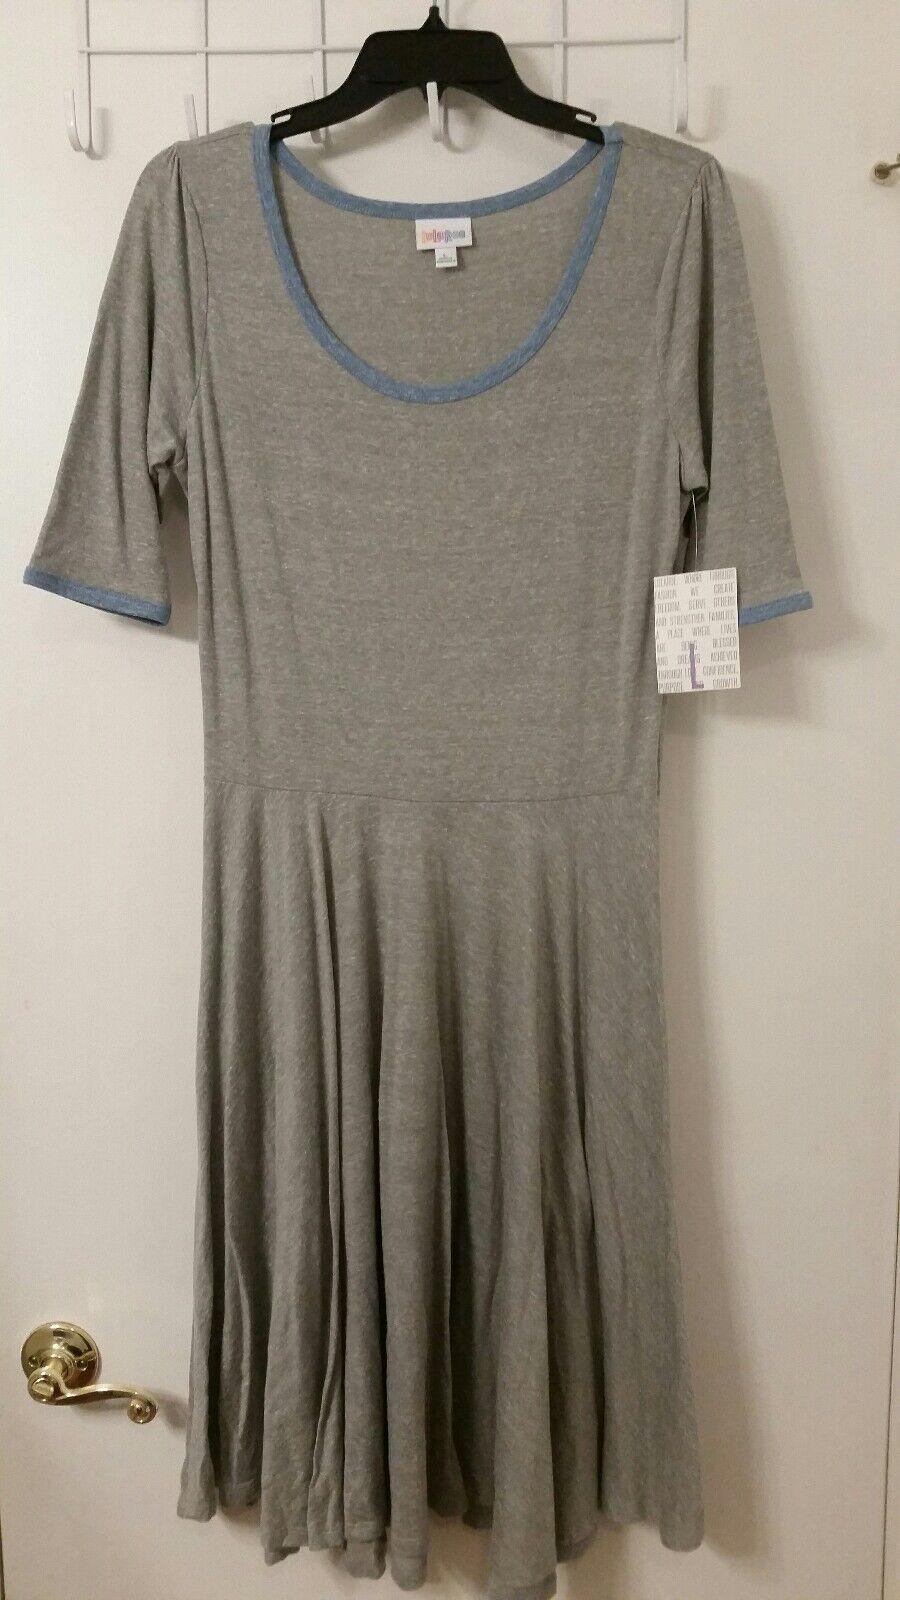 LuLaRoe heathered Nicole dress BRAND NEW WITH TAGS